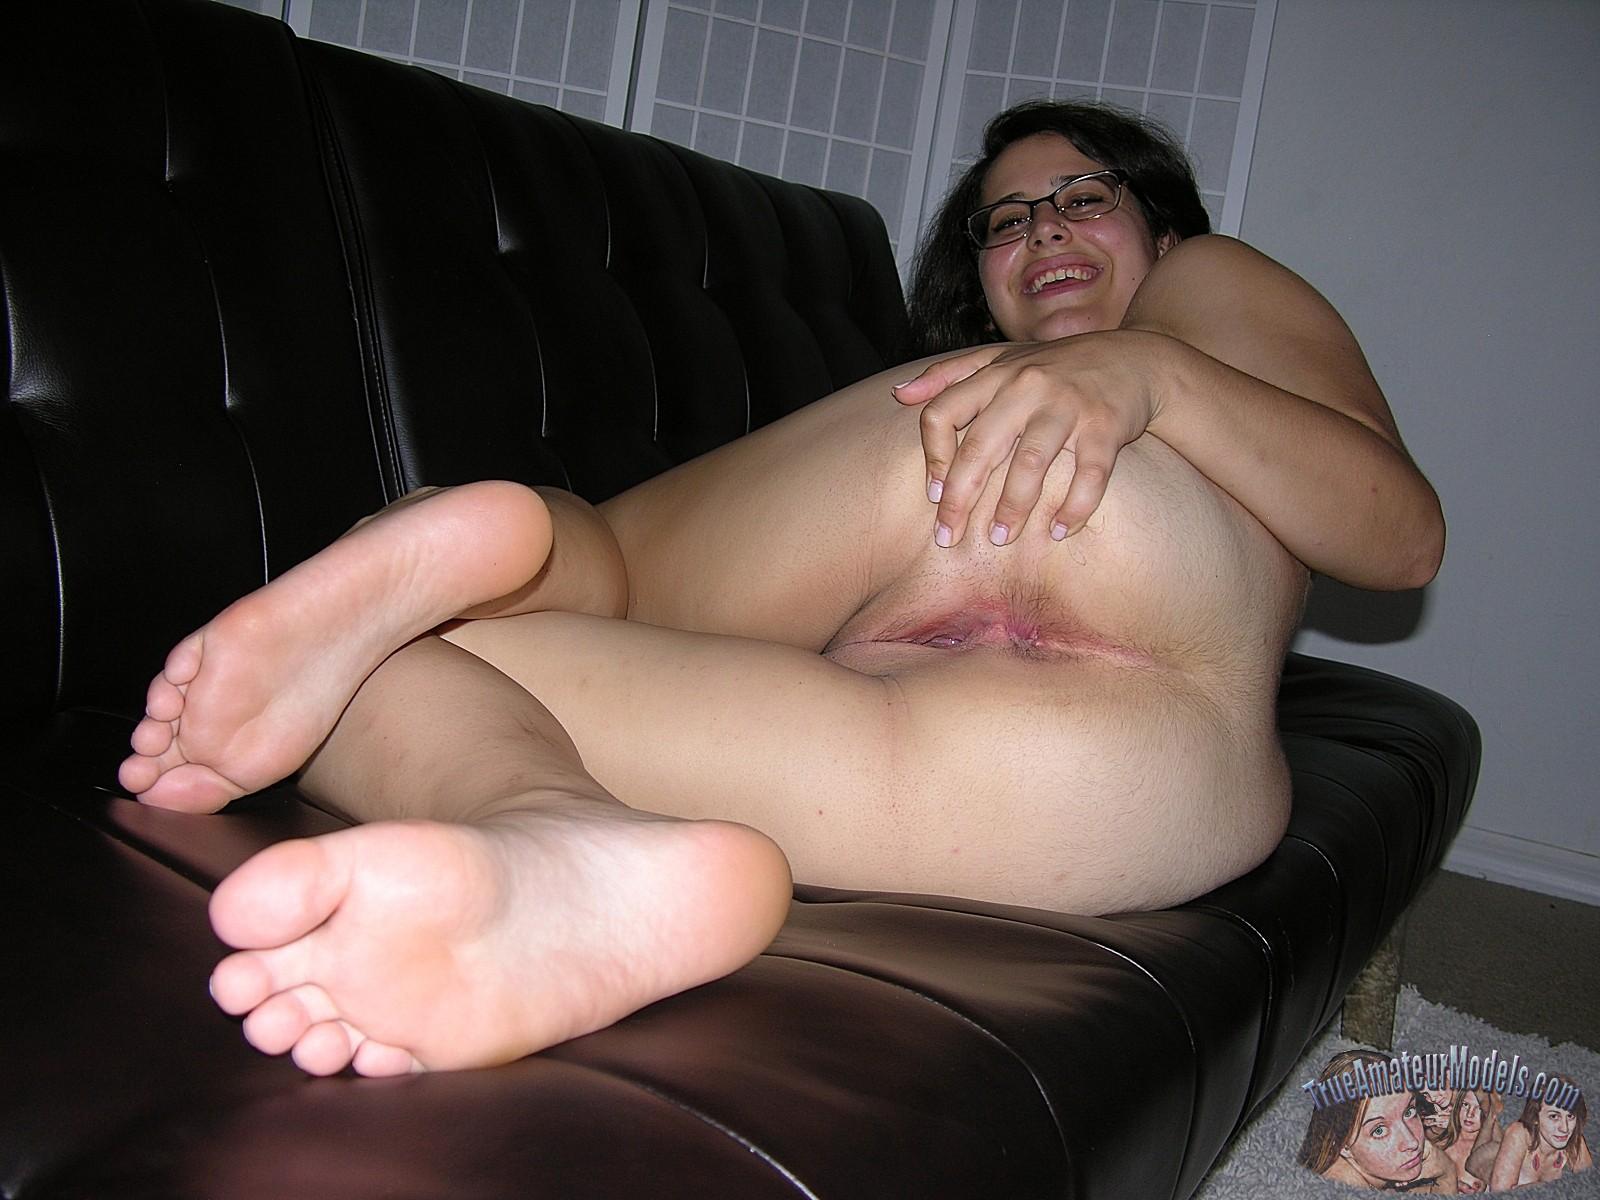 amature nude girls ass